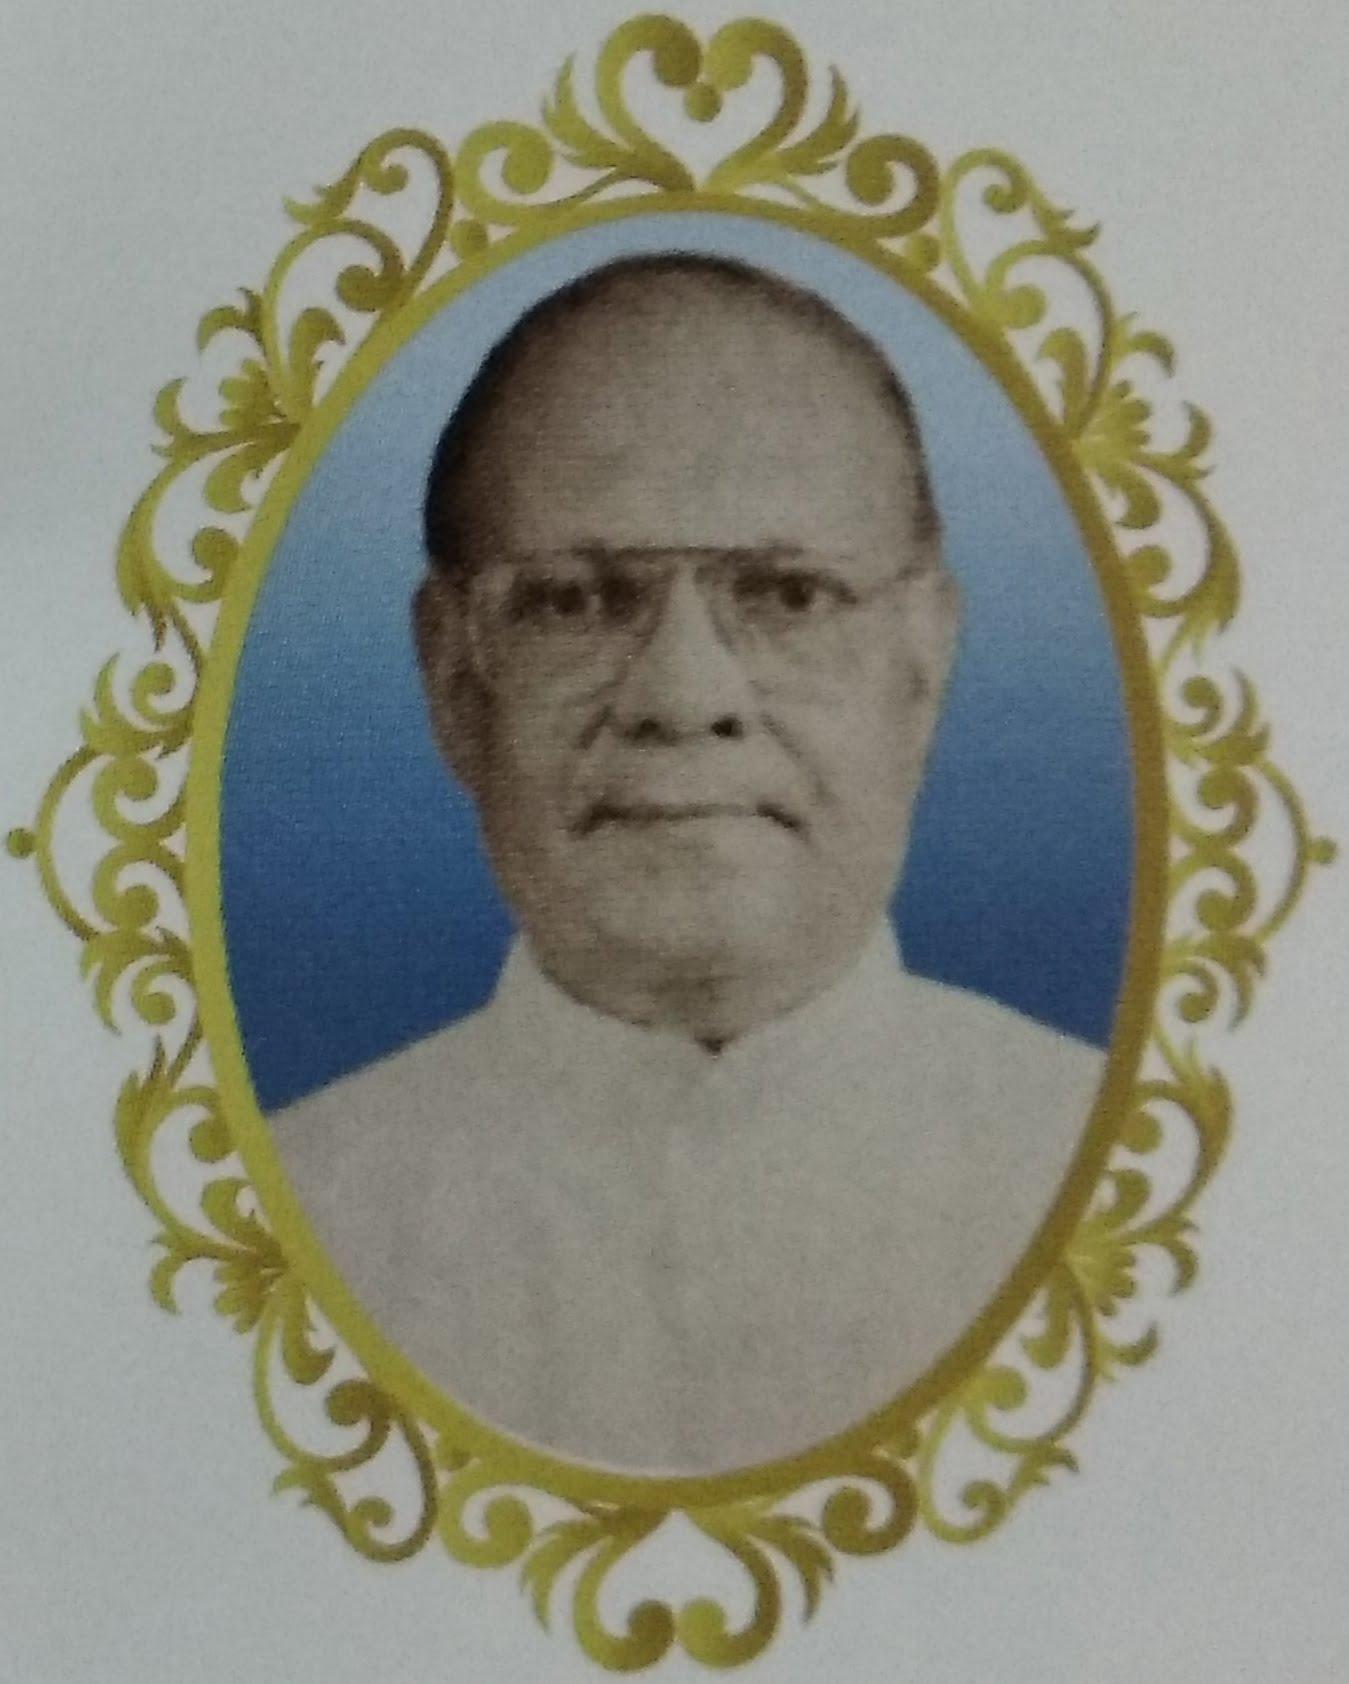 Fr. Mark Pallan